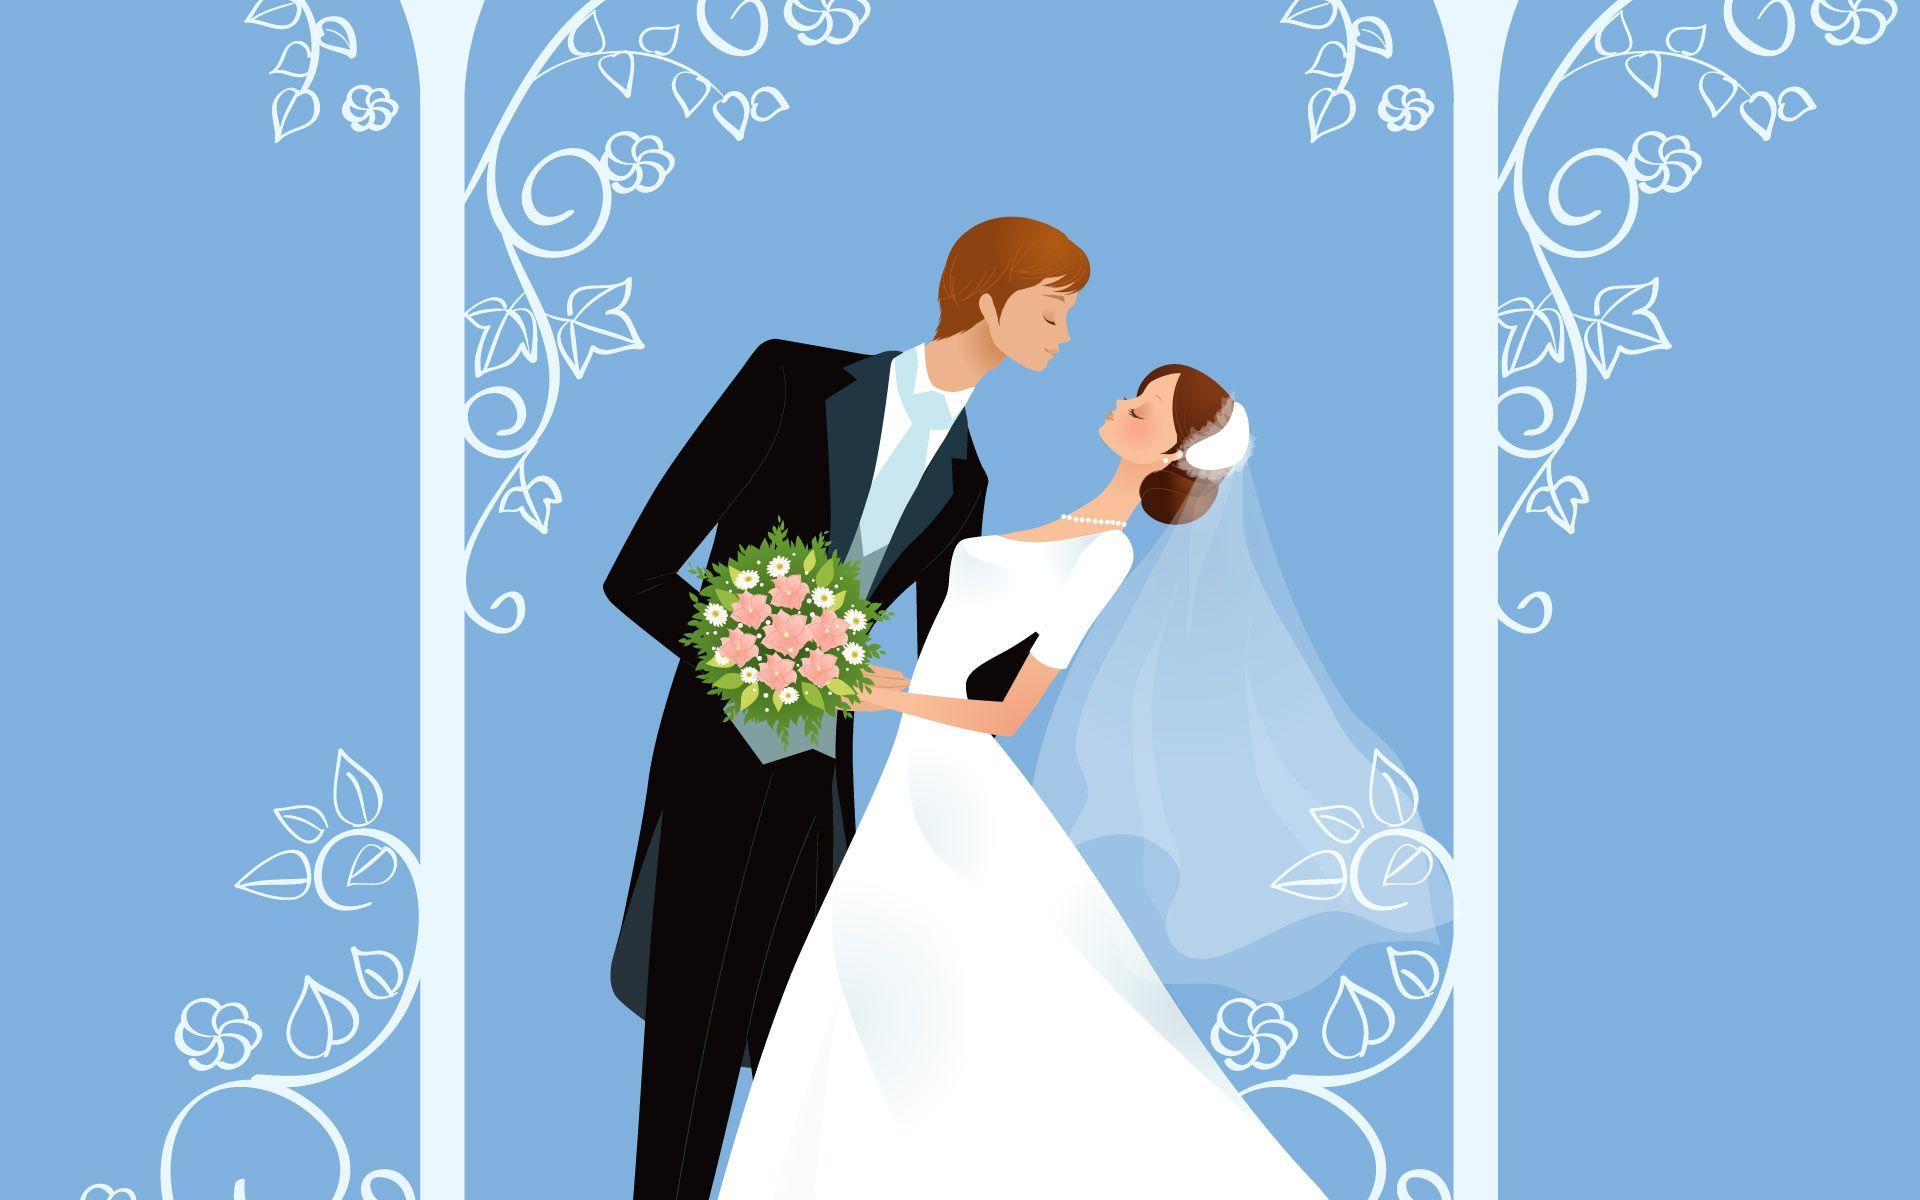 Открытка для молодоженов на свадьбу